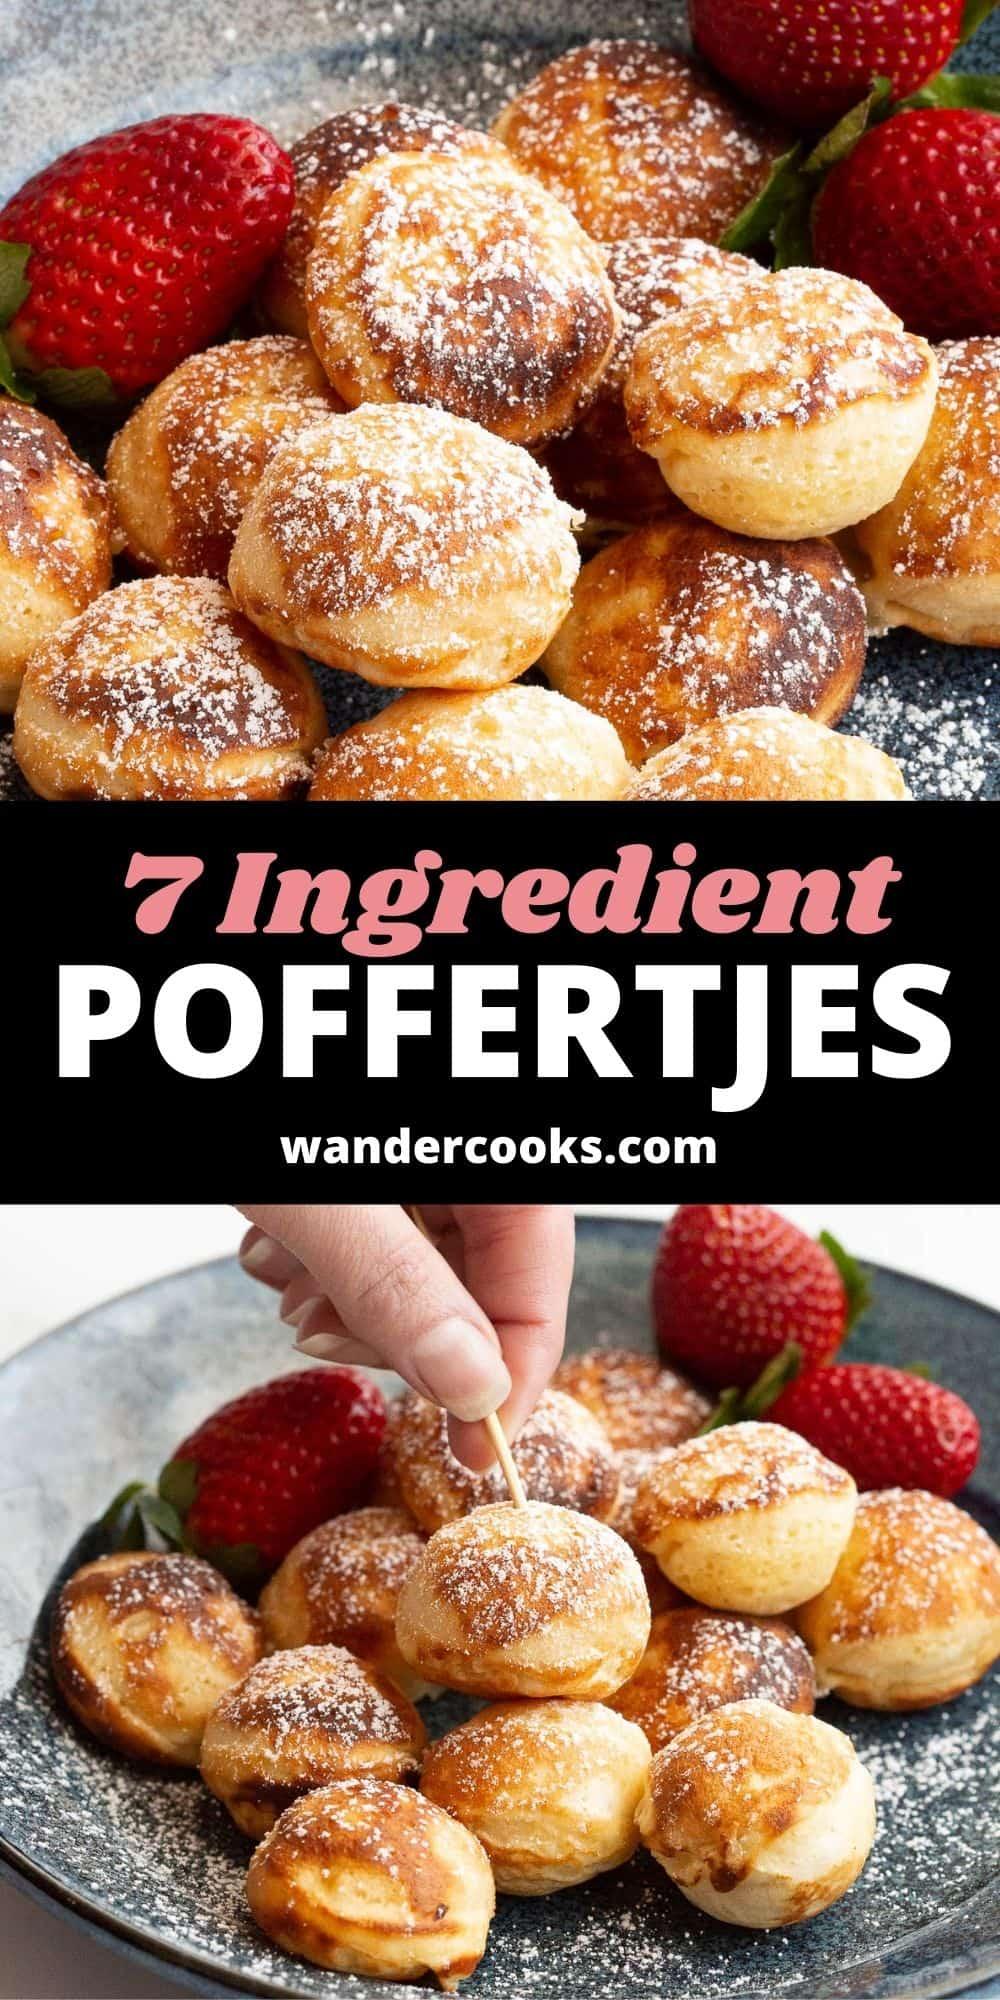 Simple Poffertjes - Dutch Mini Pancakes